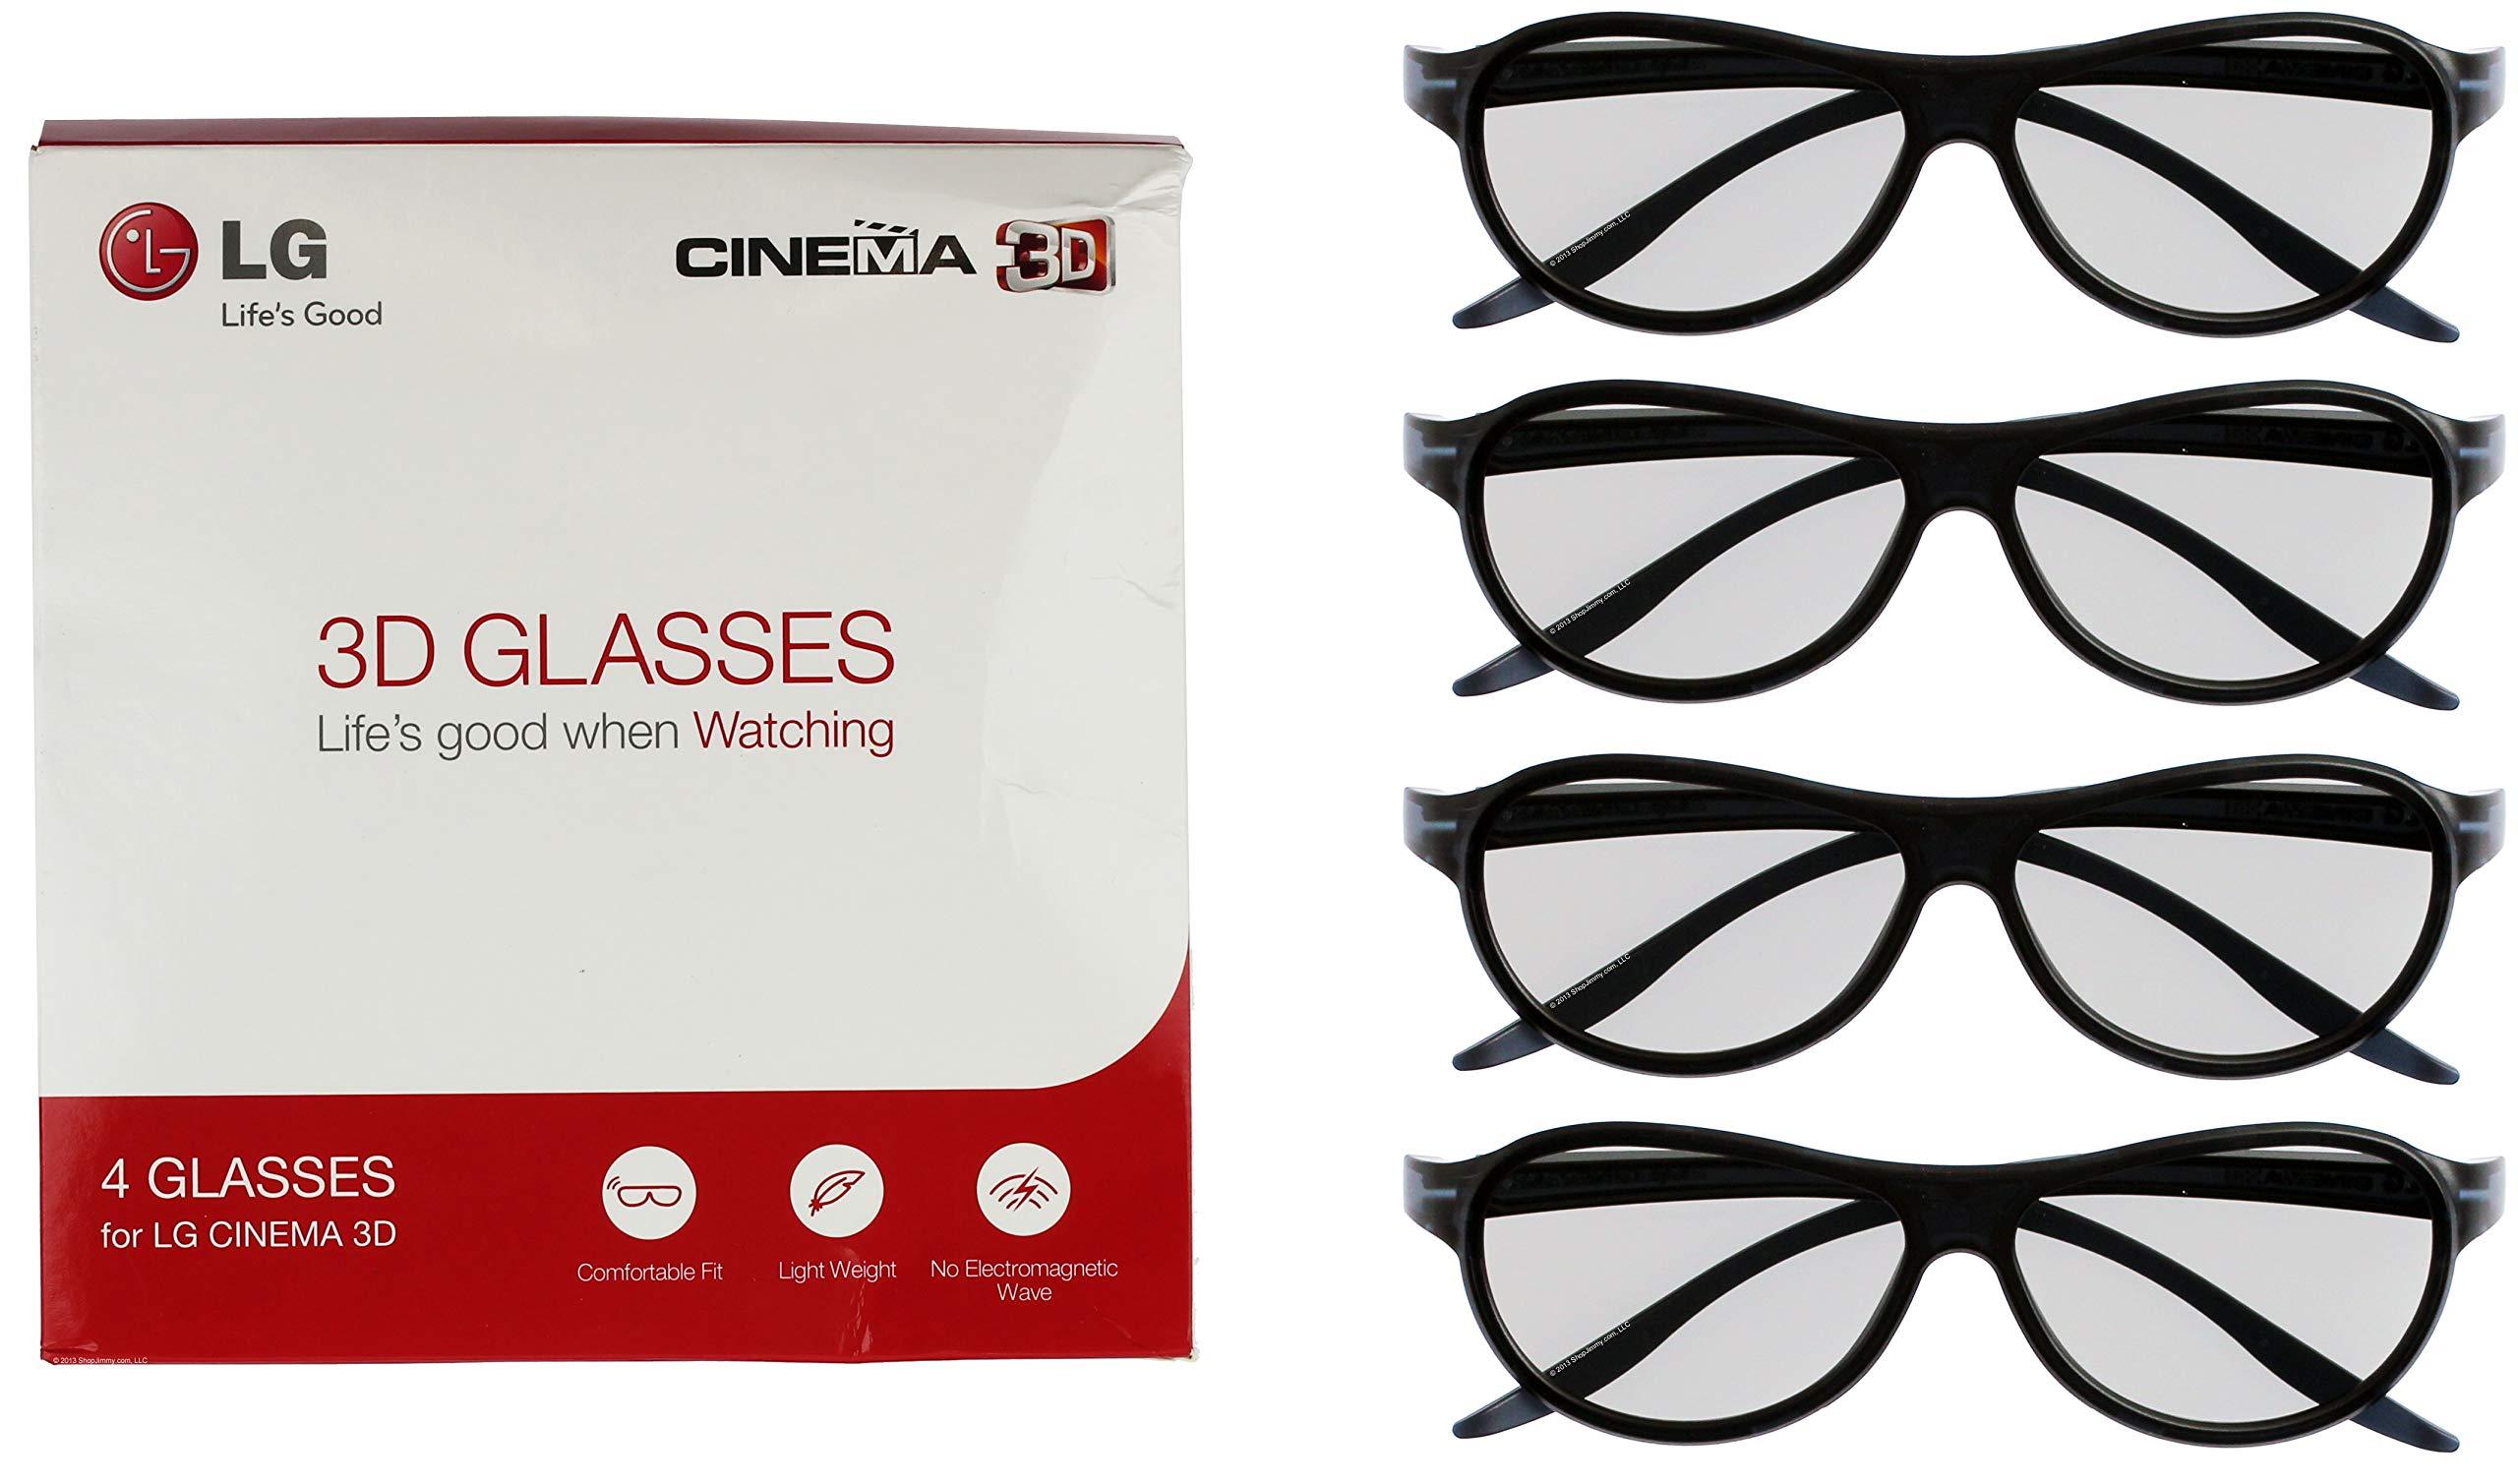 LG Cinema 3D Glasses AG-F310 2012 New Model 2 pairs Black